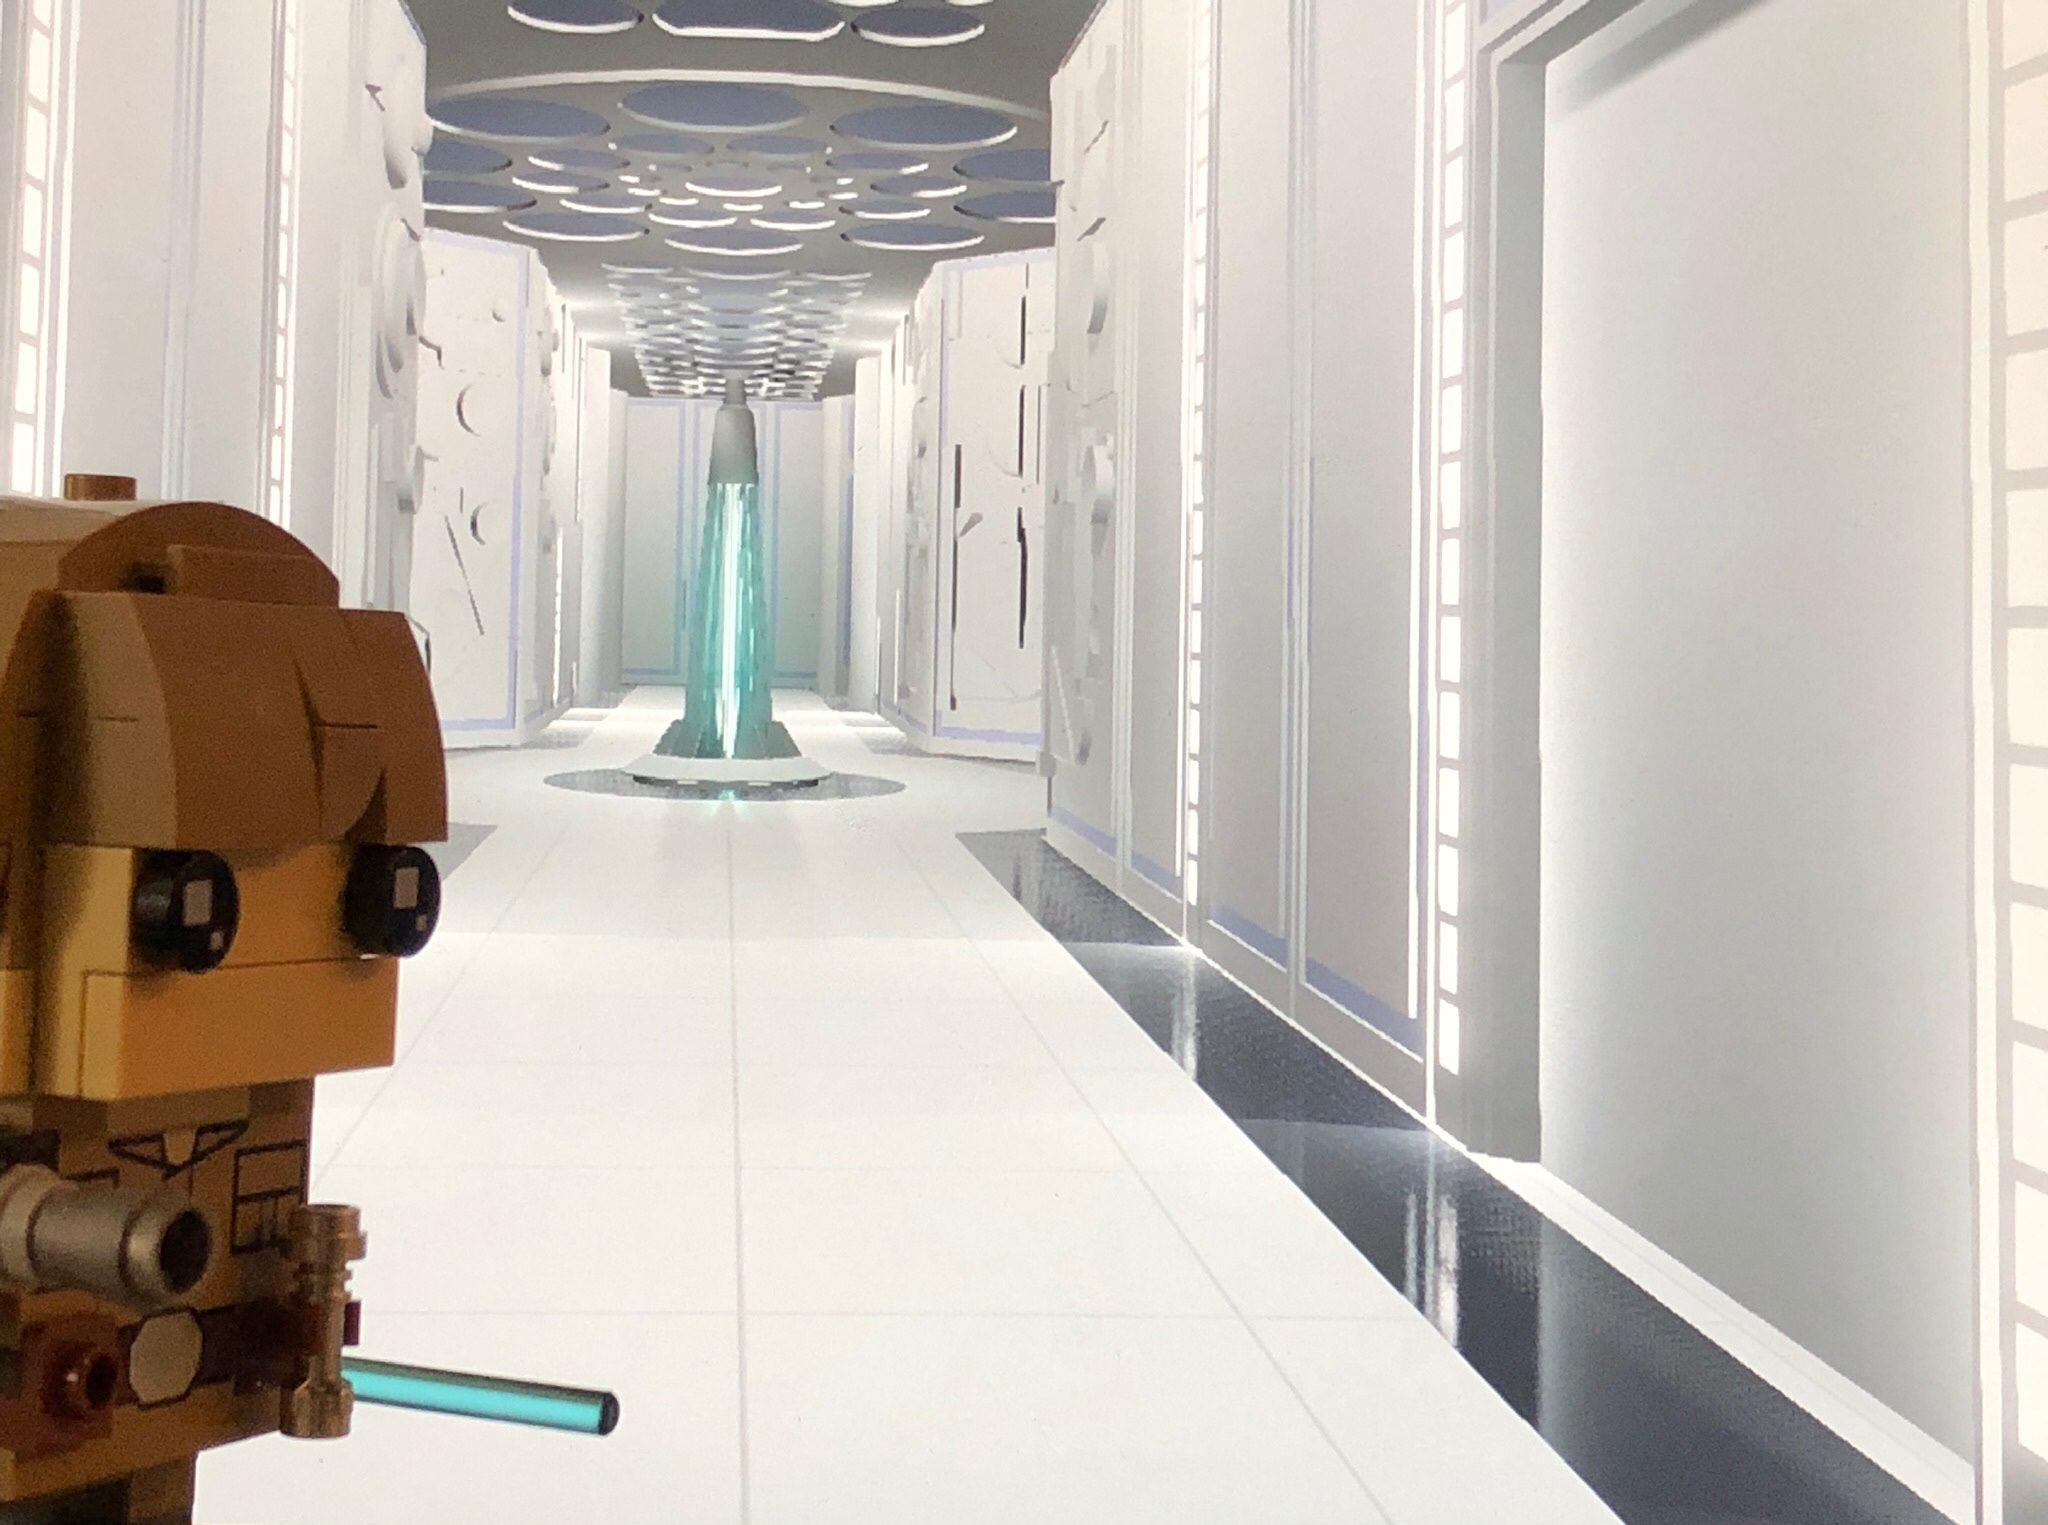 LEGO Brickheadz Luke Skywalker